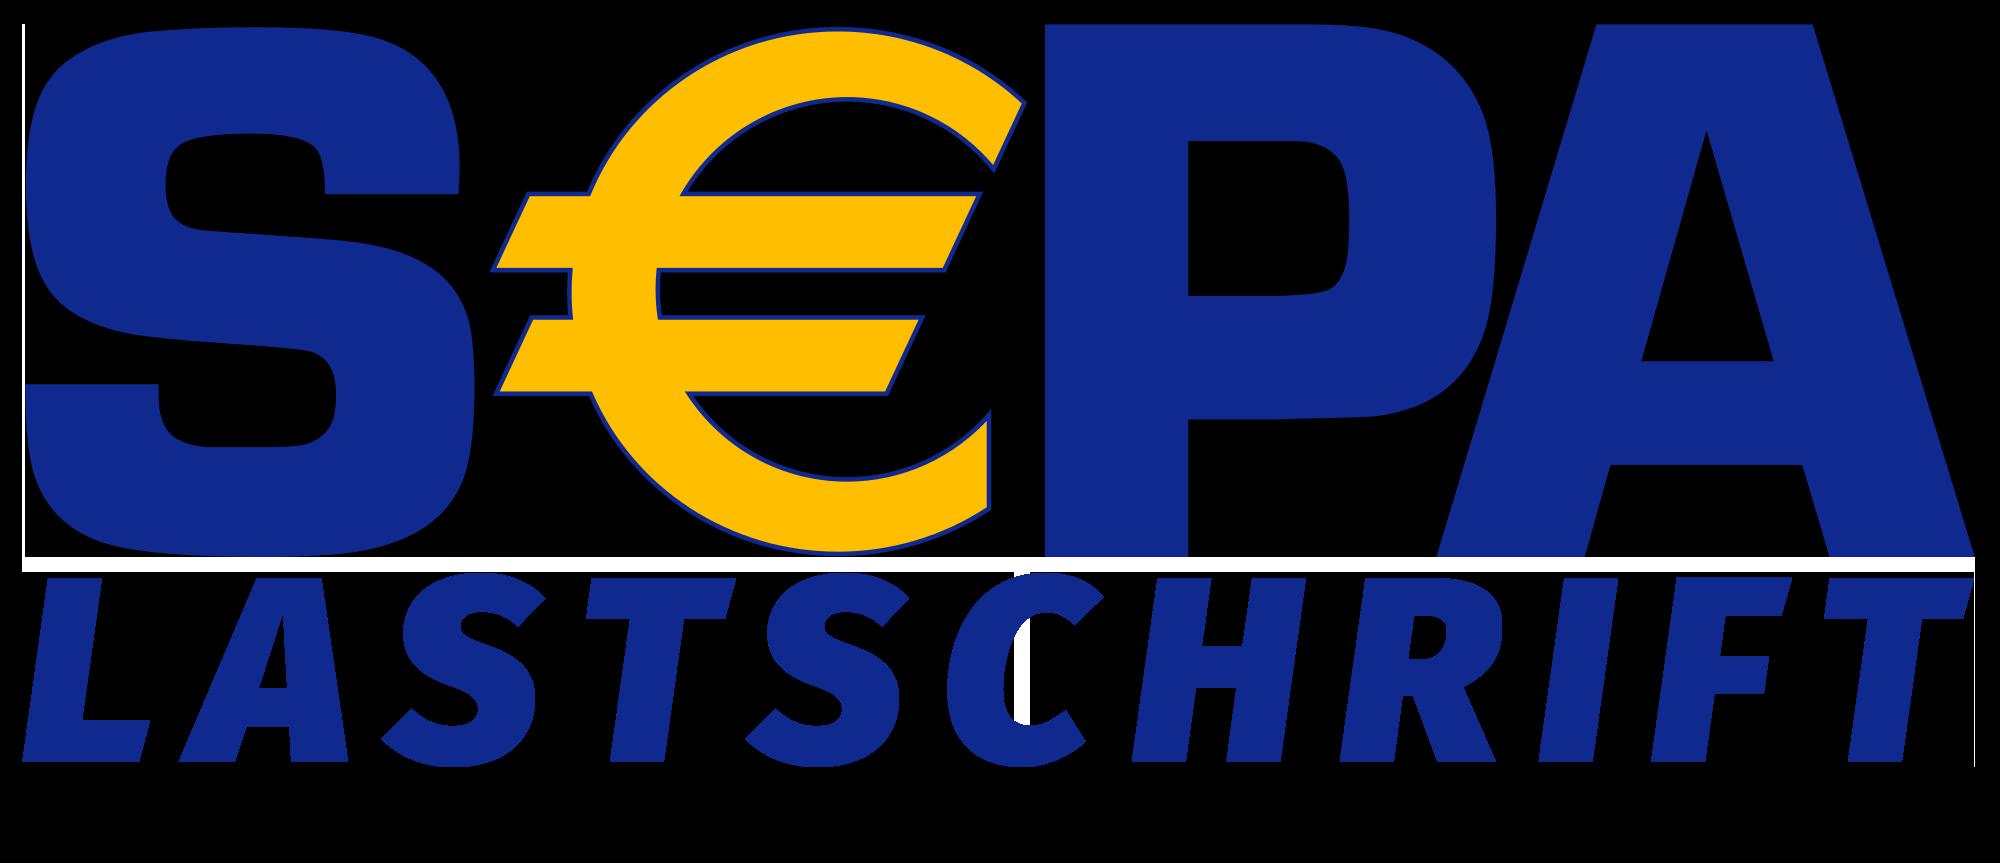 sepa_lastschrift_logo.png